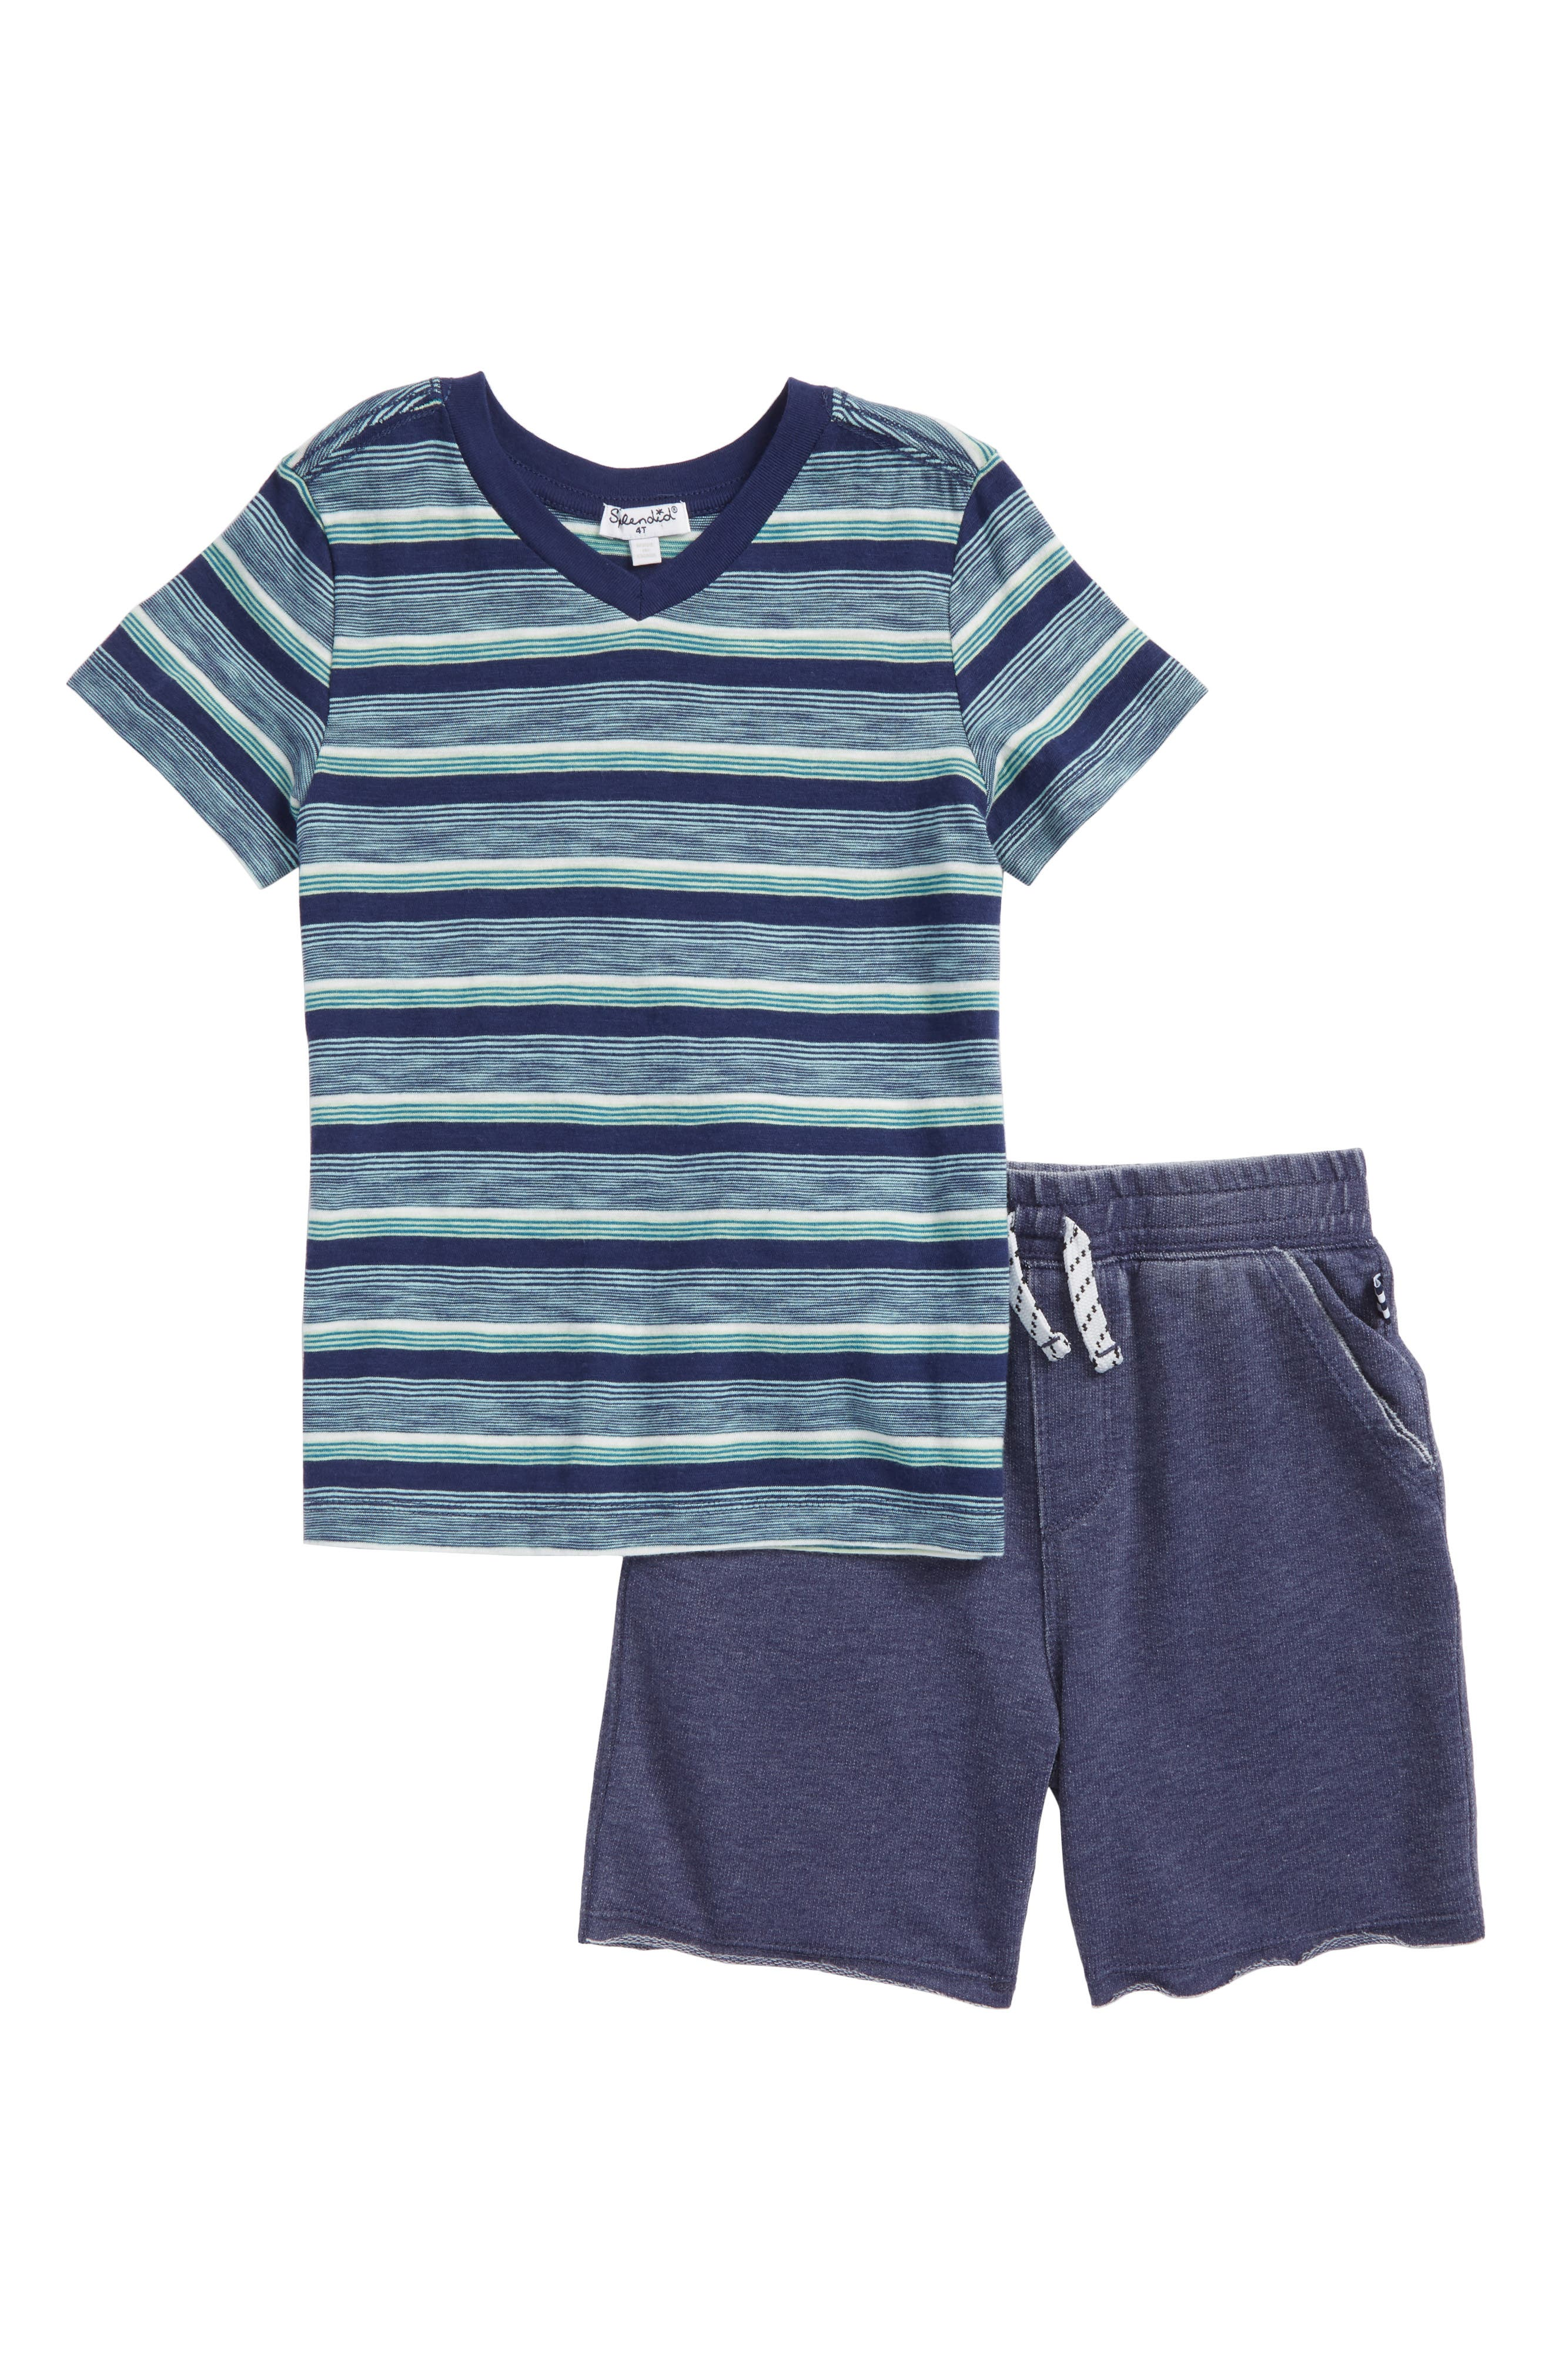 V-Neck T-Shirt & Shorts Set,                             Main thumbnail 1, color,                             420